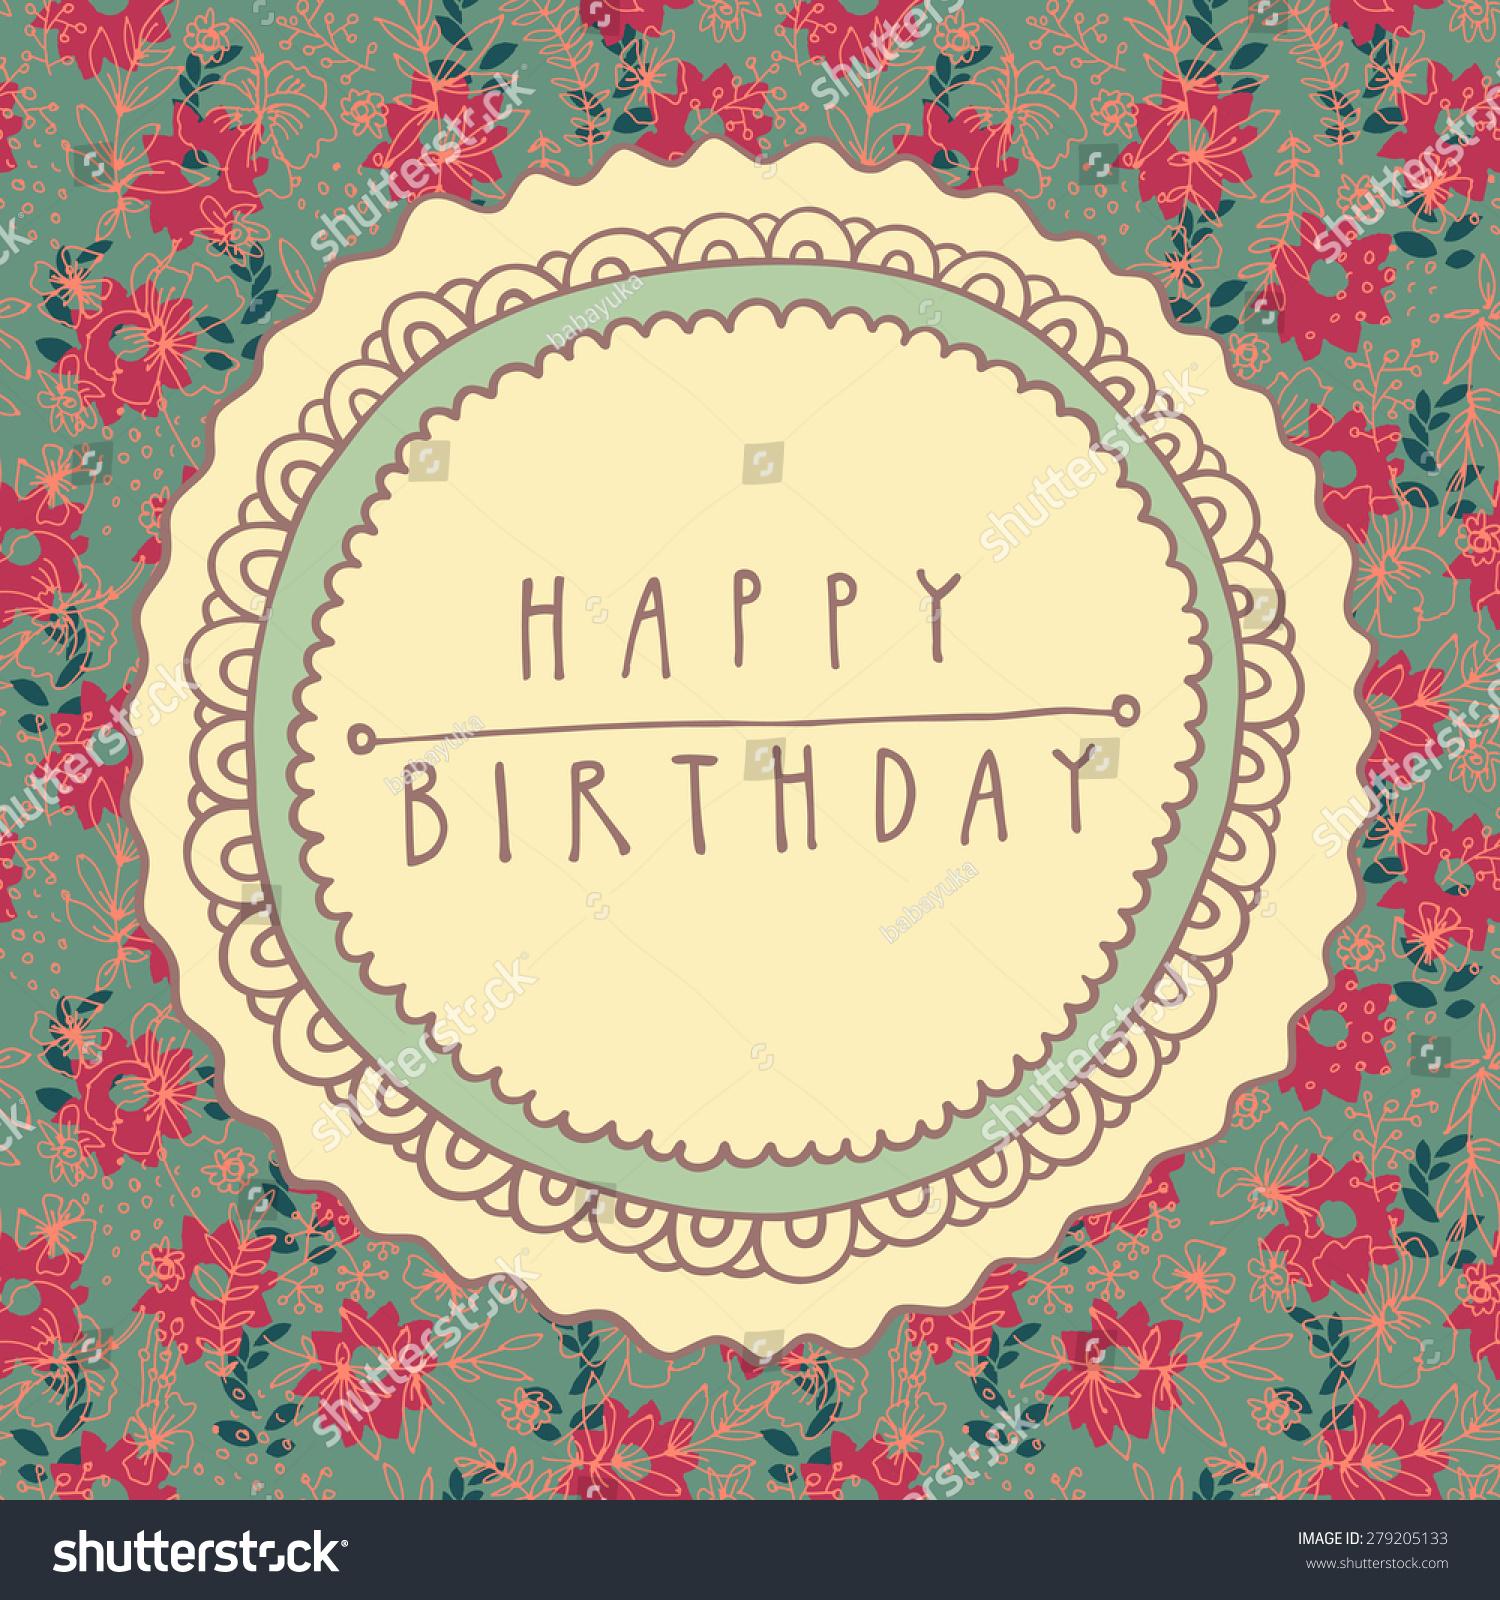 Colorful Happy Birthday Shabby Chic Handdrawn Stock Vector ...